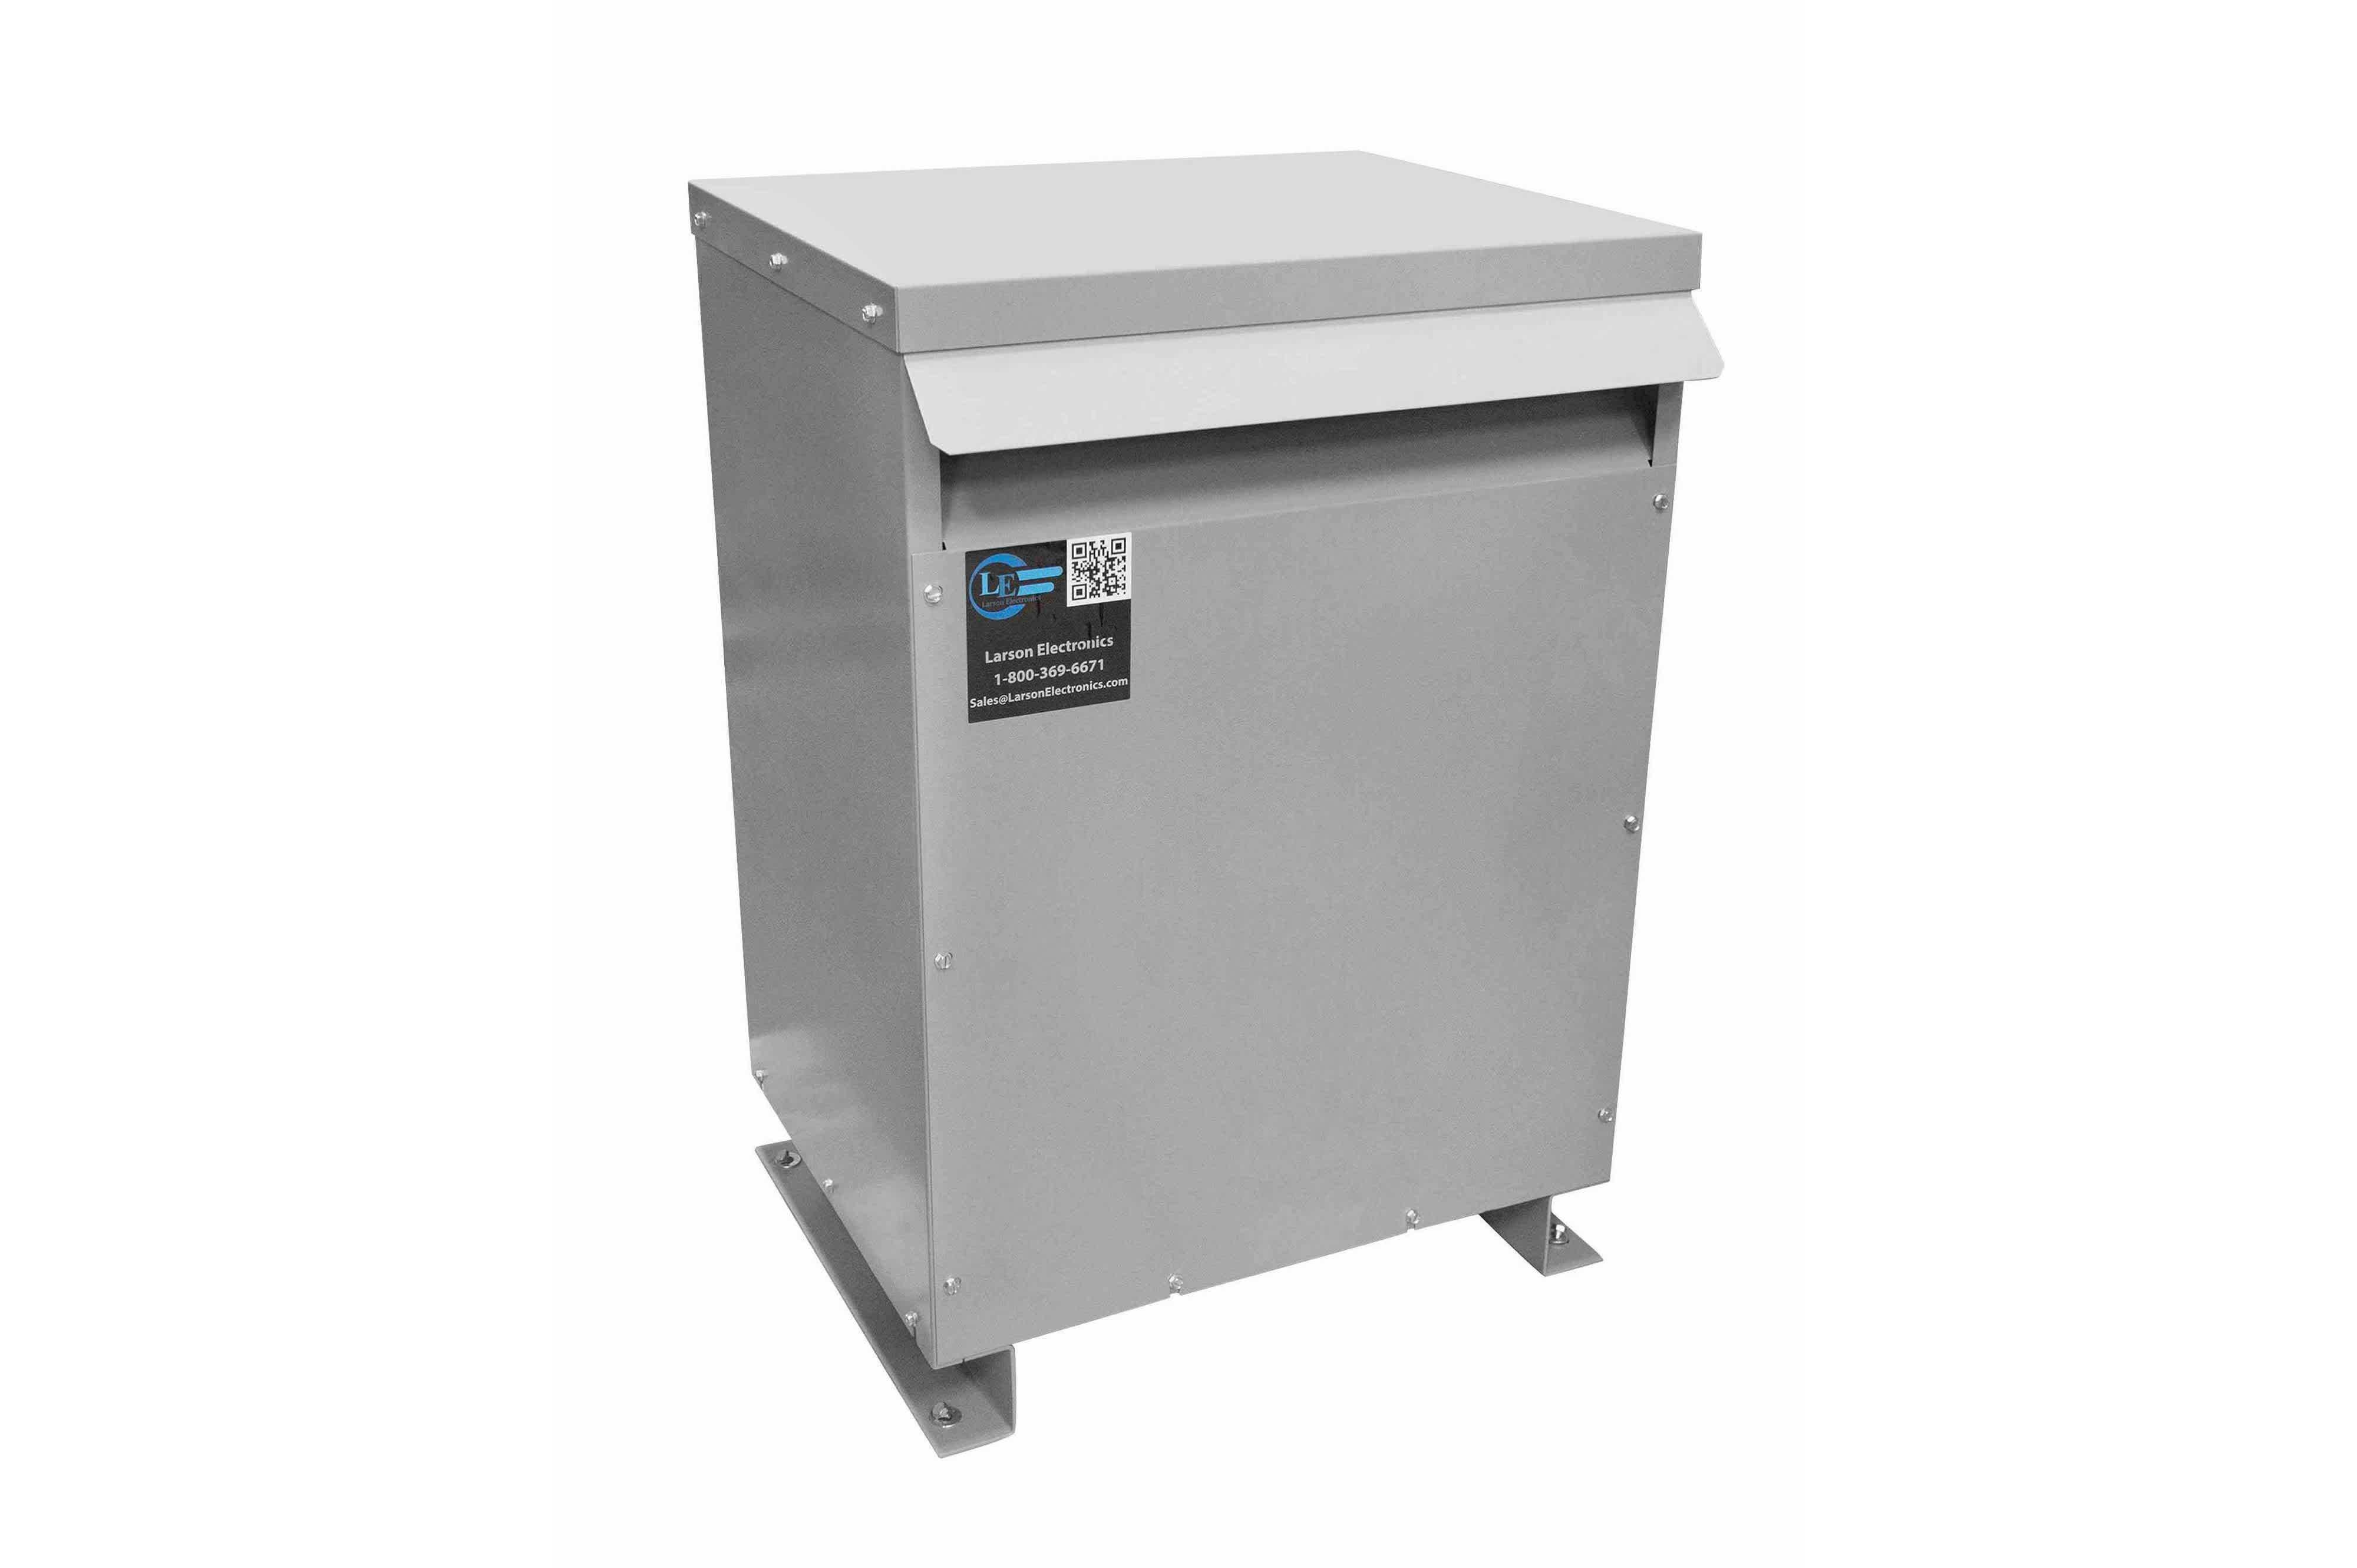 900 kVA 3PH Isolation Transformer, 208V Wye Primary, 208Y/120 Wye-N Secondary, N3R, Ventilated, 60 Hz